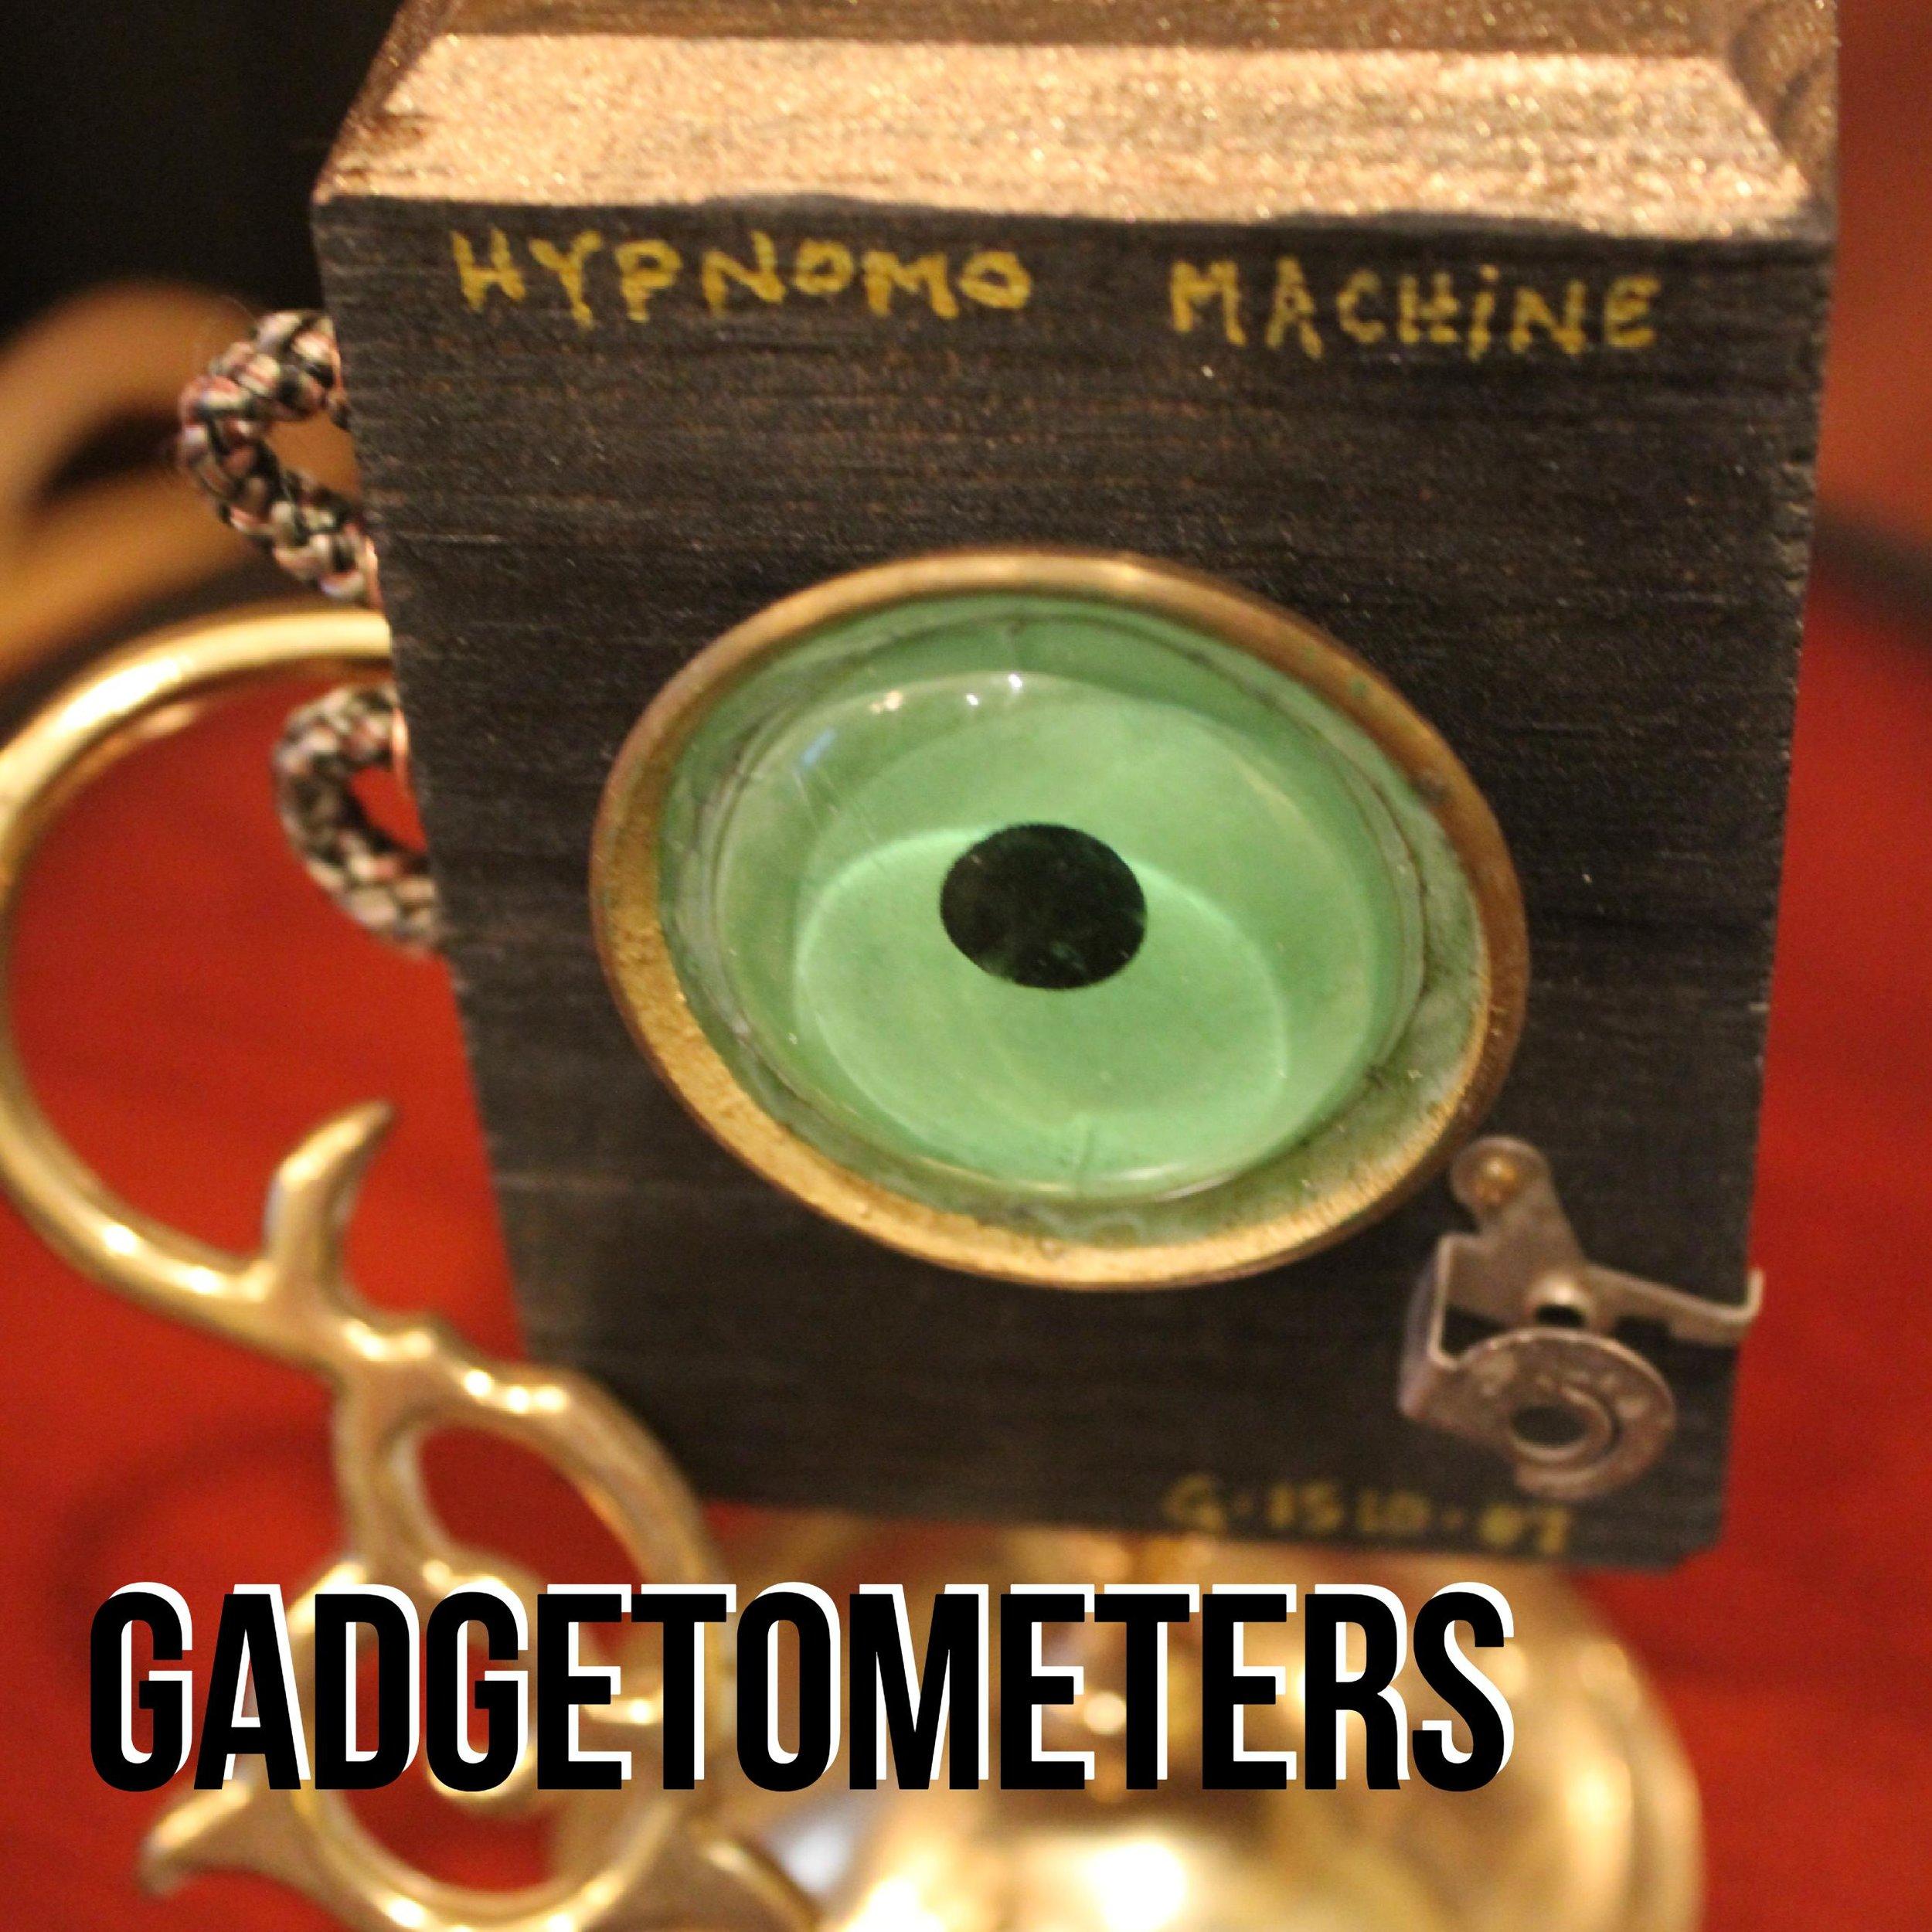 Gadgetometer